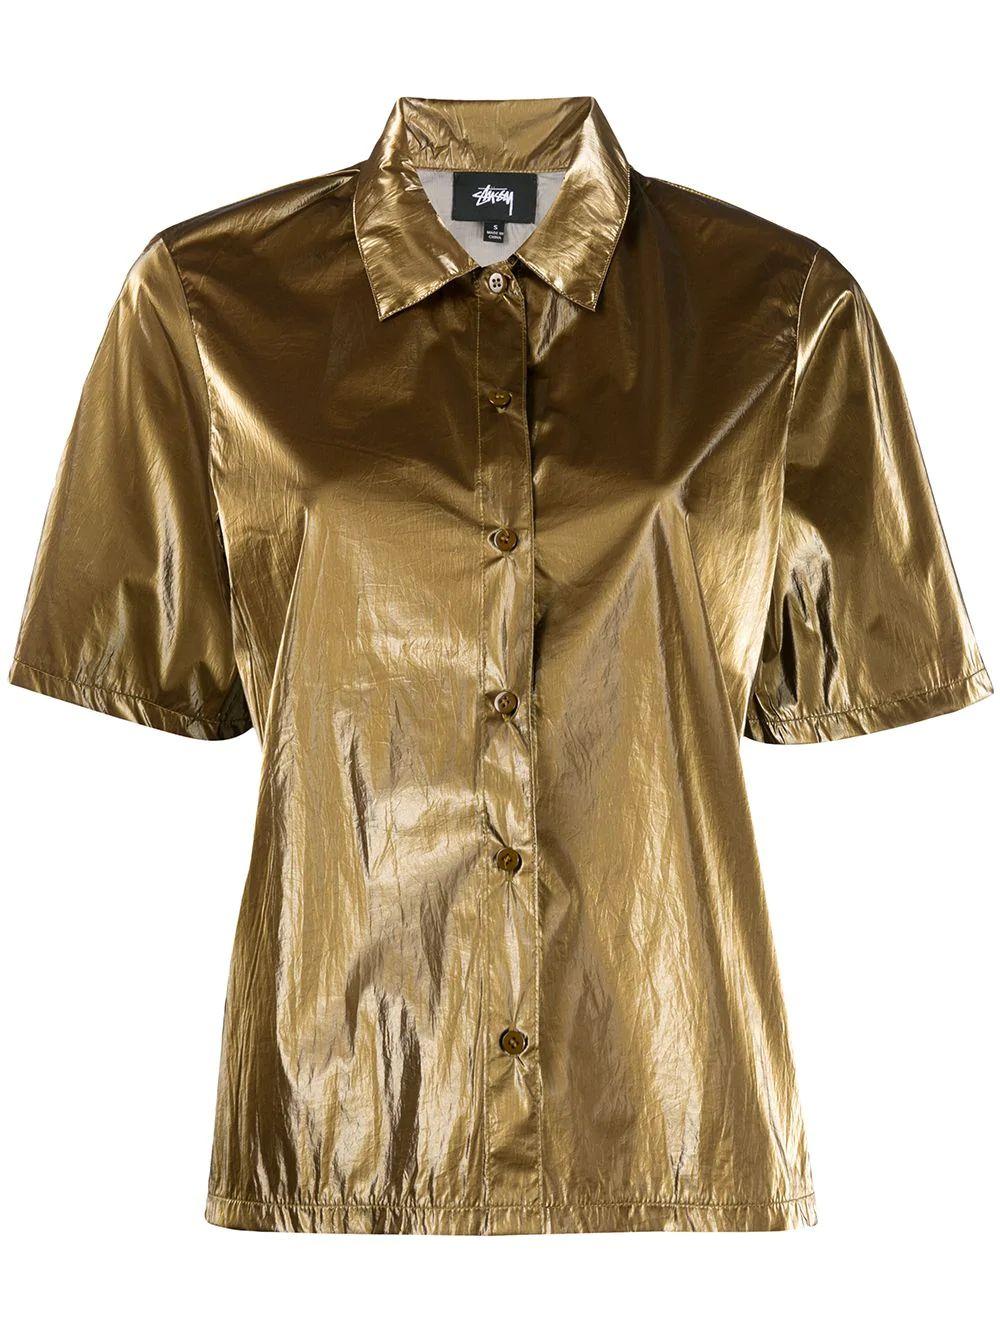 Stussy GOLD POLYAMIDE SHIRT